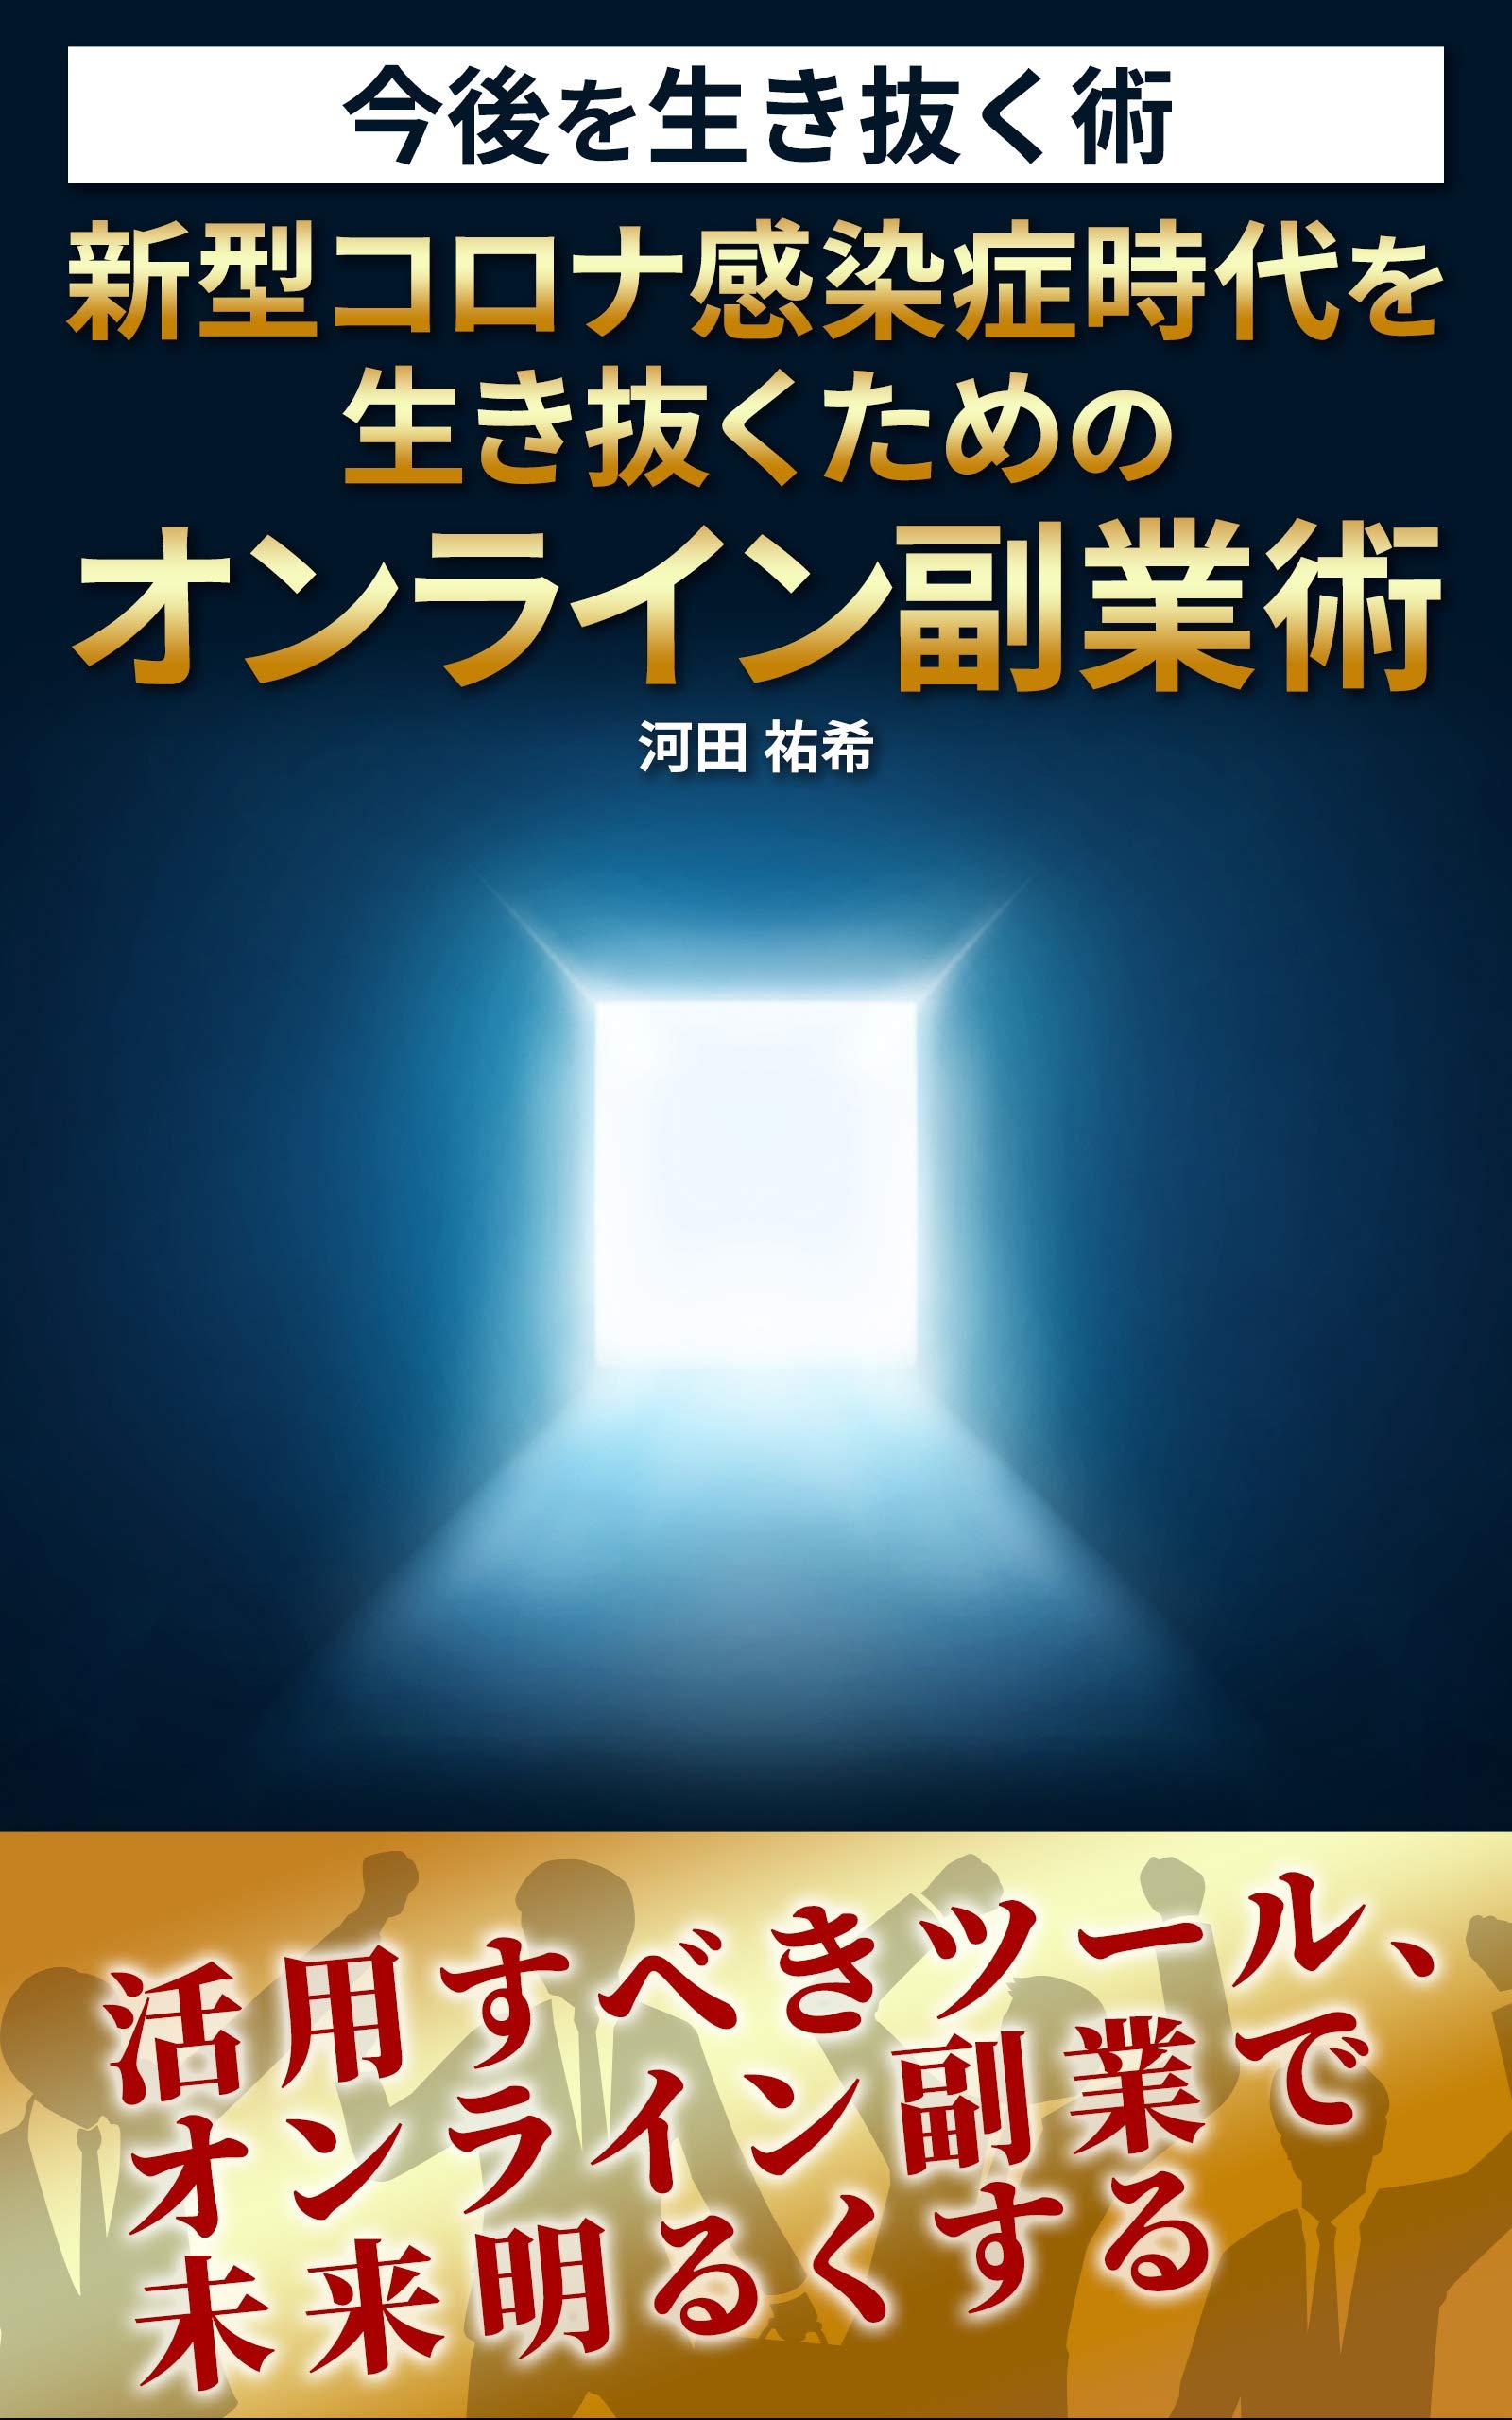 shingatakoronakansenshoujidaiwoikinukutamenoonrainhukugyoujutu: kongowoikinukusube (Japanese Edition)